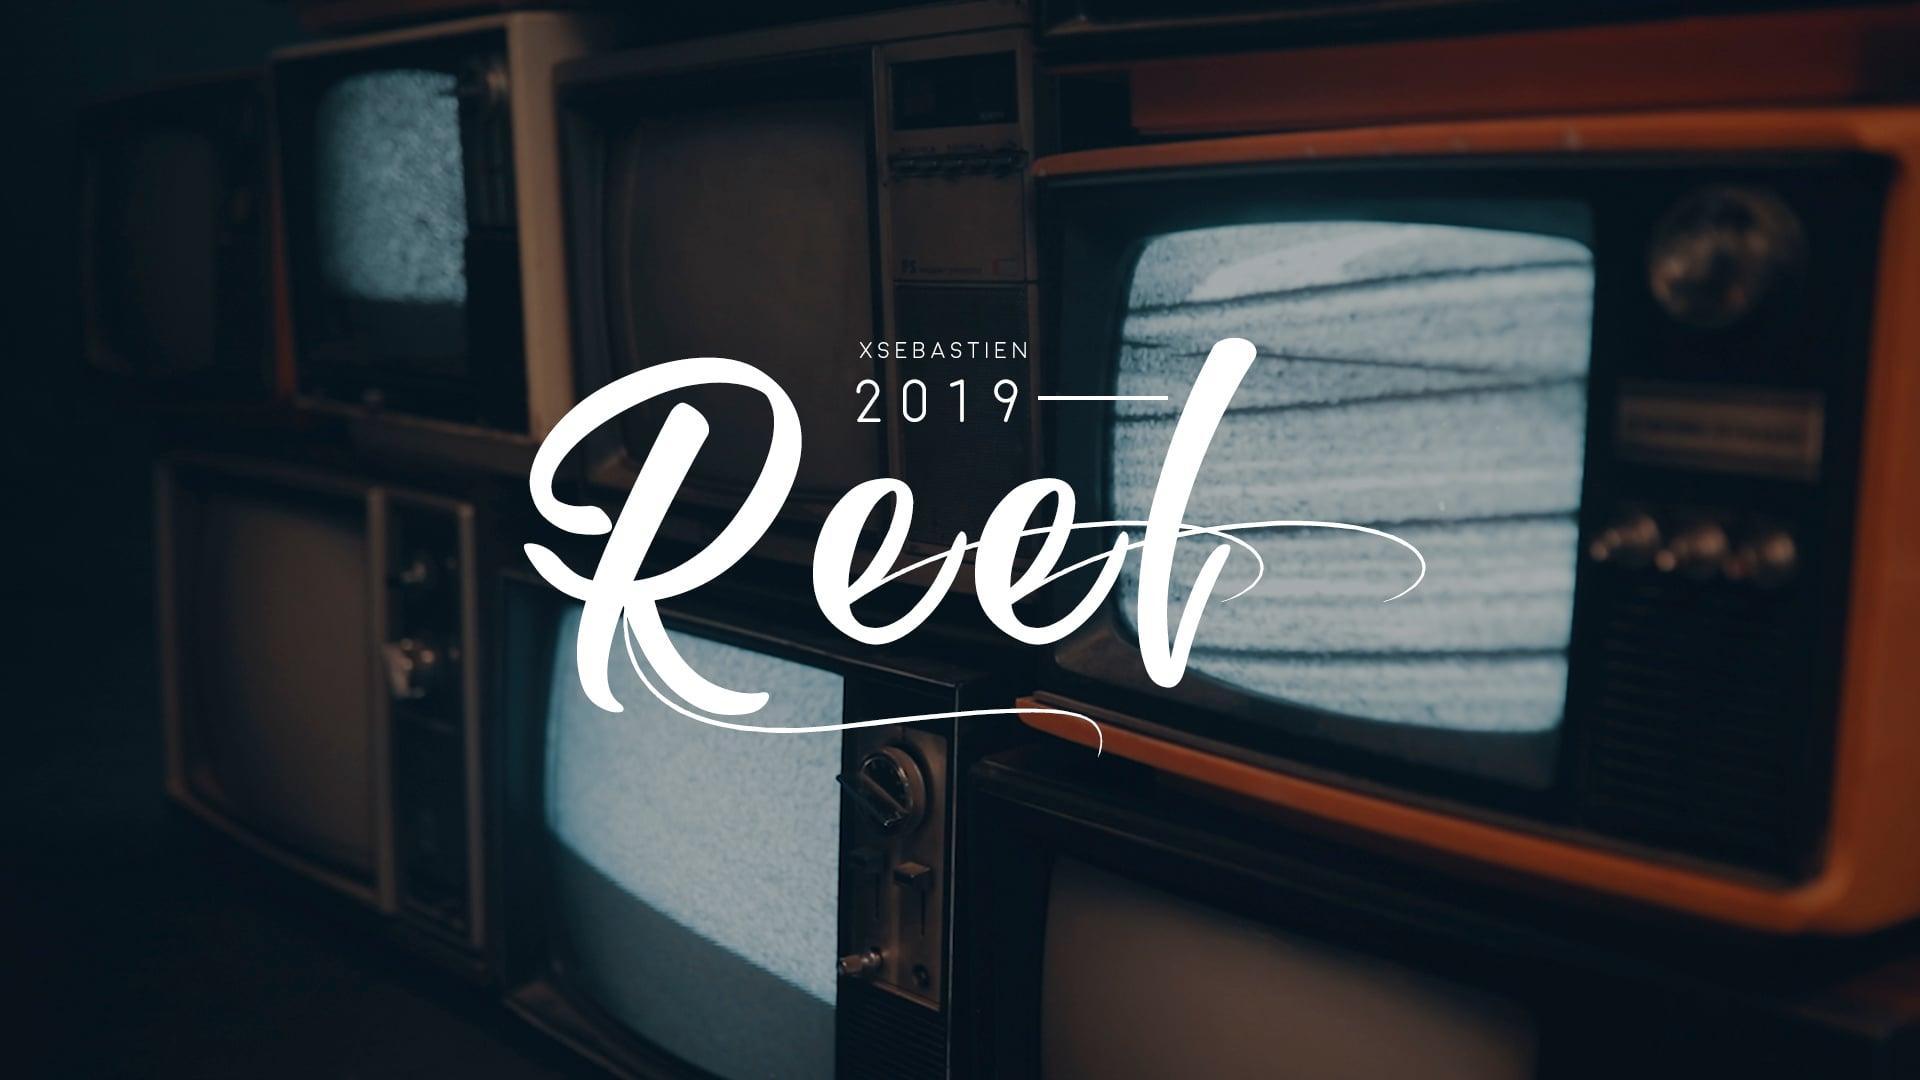 Reel - Sebastien - 2019